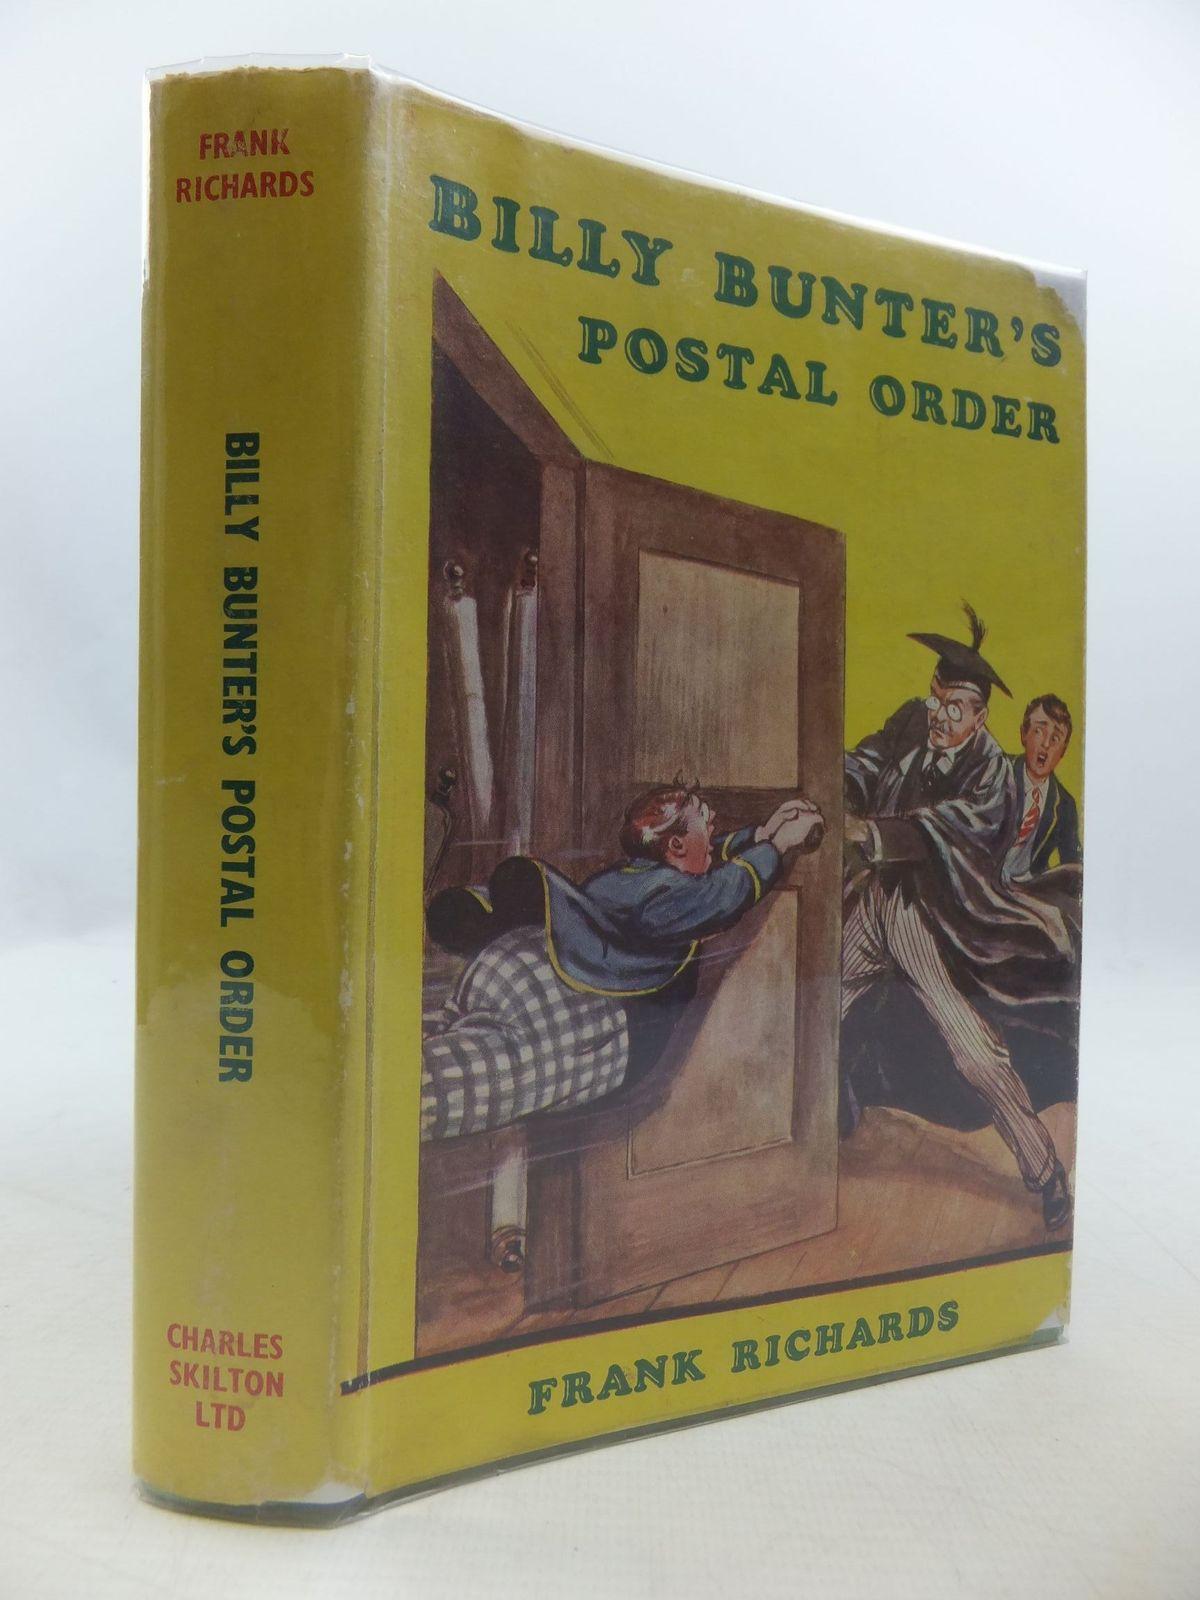 Billy bunter 39 s postal order written by richards frank for Code postal billy berclau